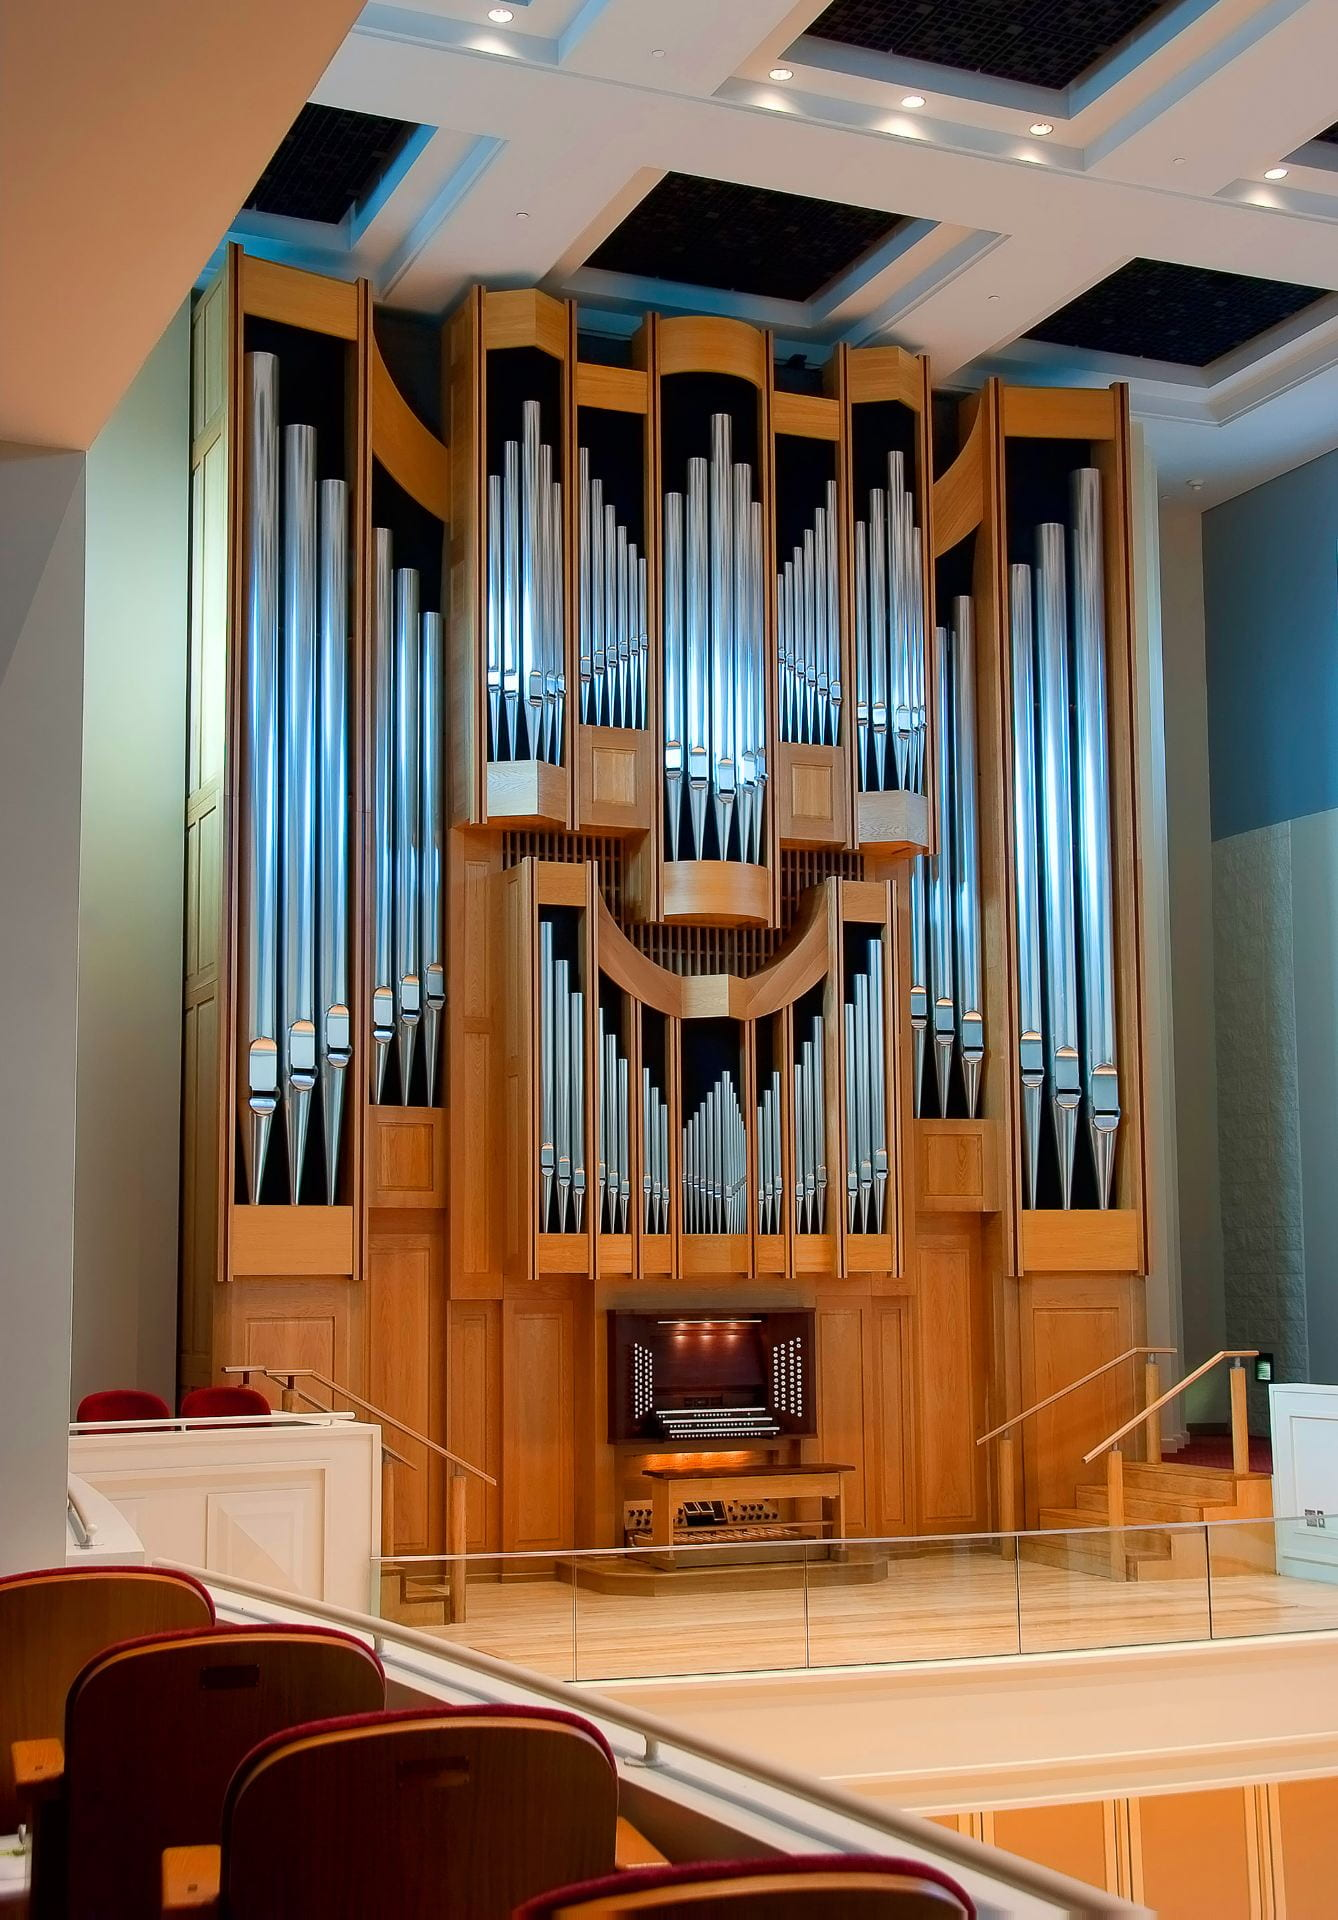 Organ in Auer Hall